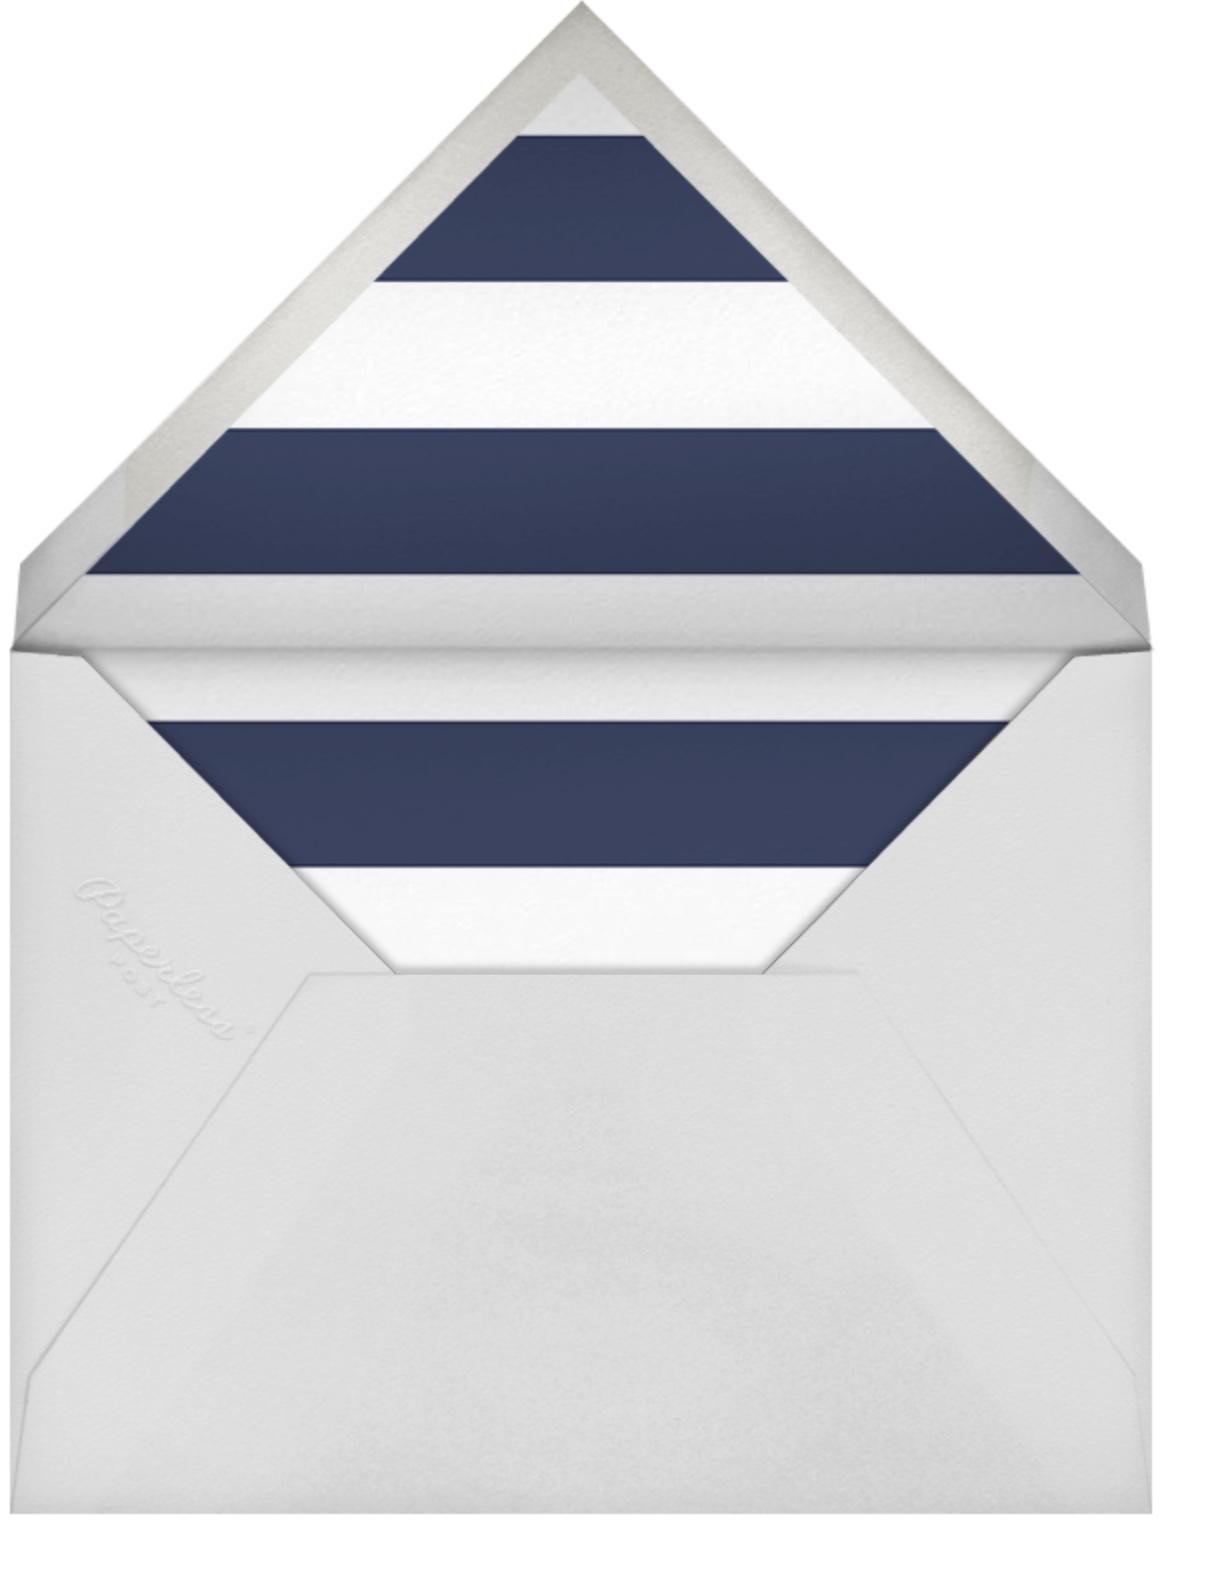 Nautical II (Invitation) - kate spade new york - All - envelope back